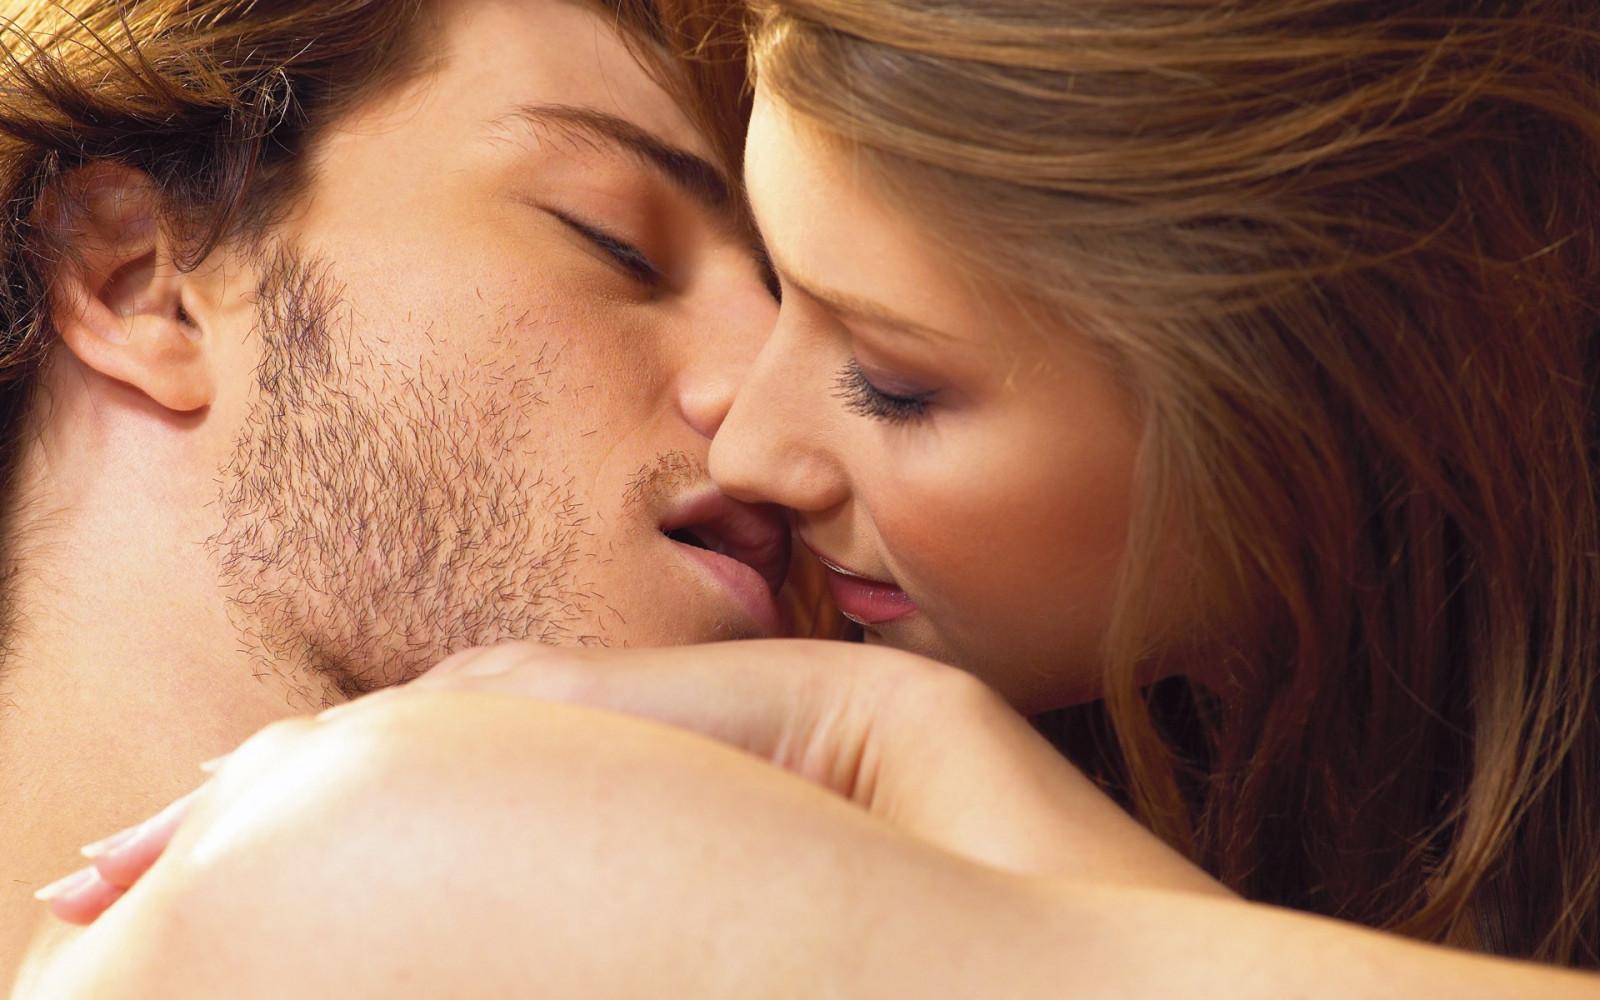 Картинки мужчине с поцелуями, днем рождения картинки